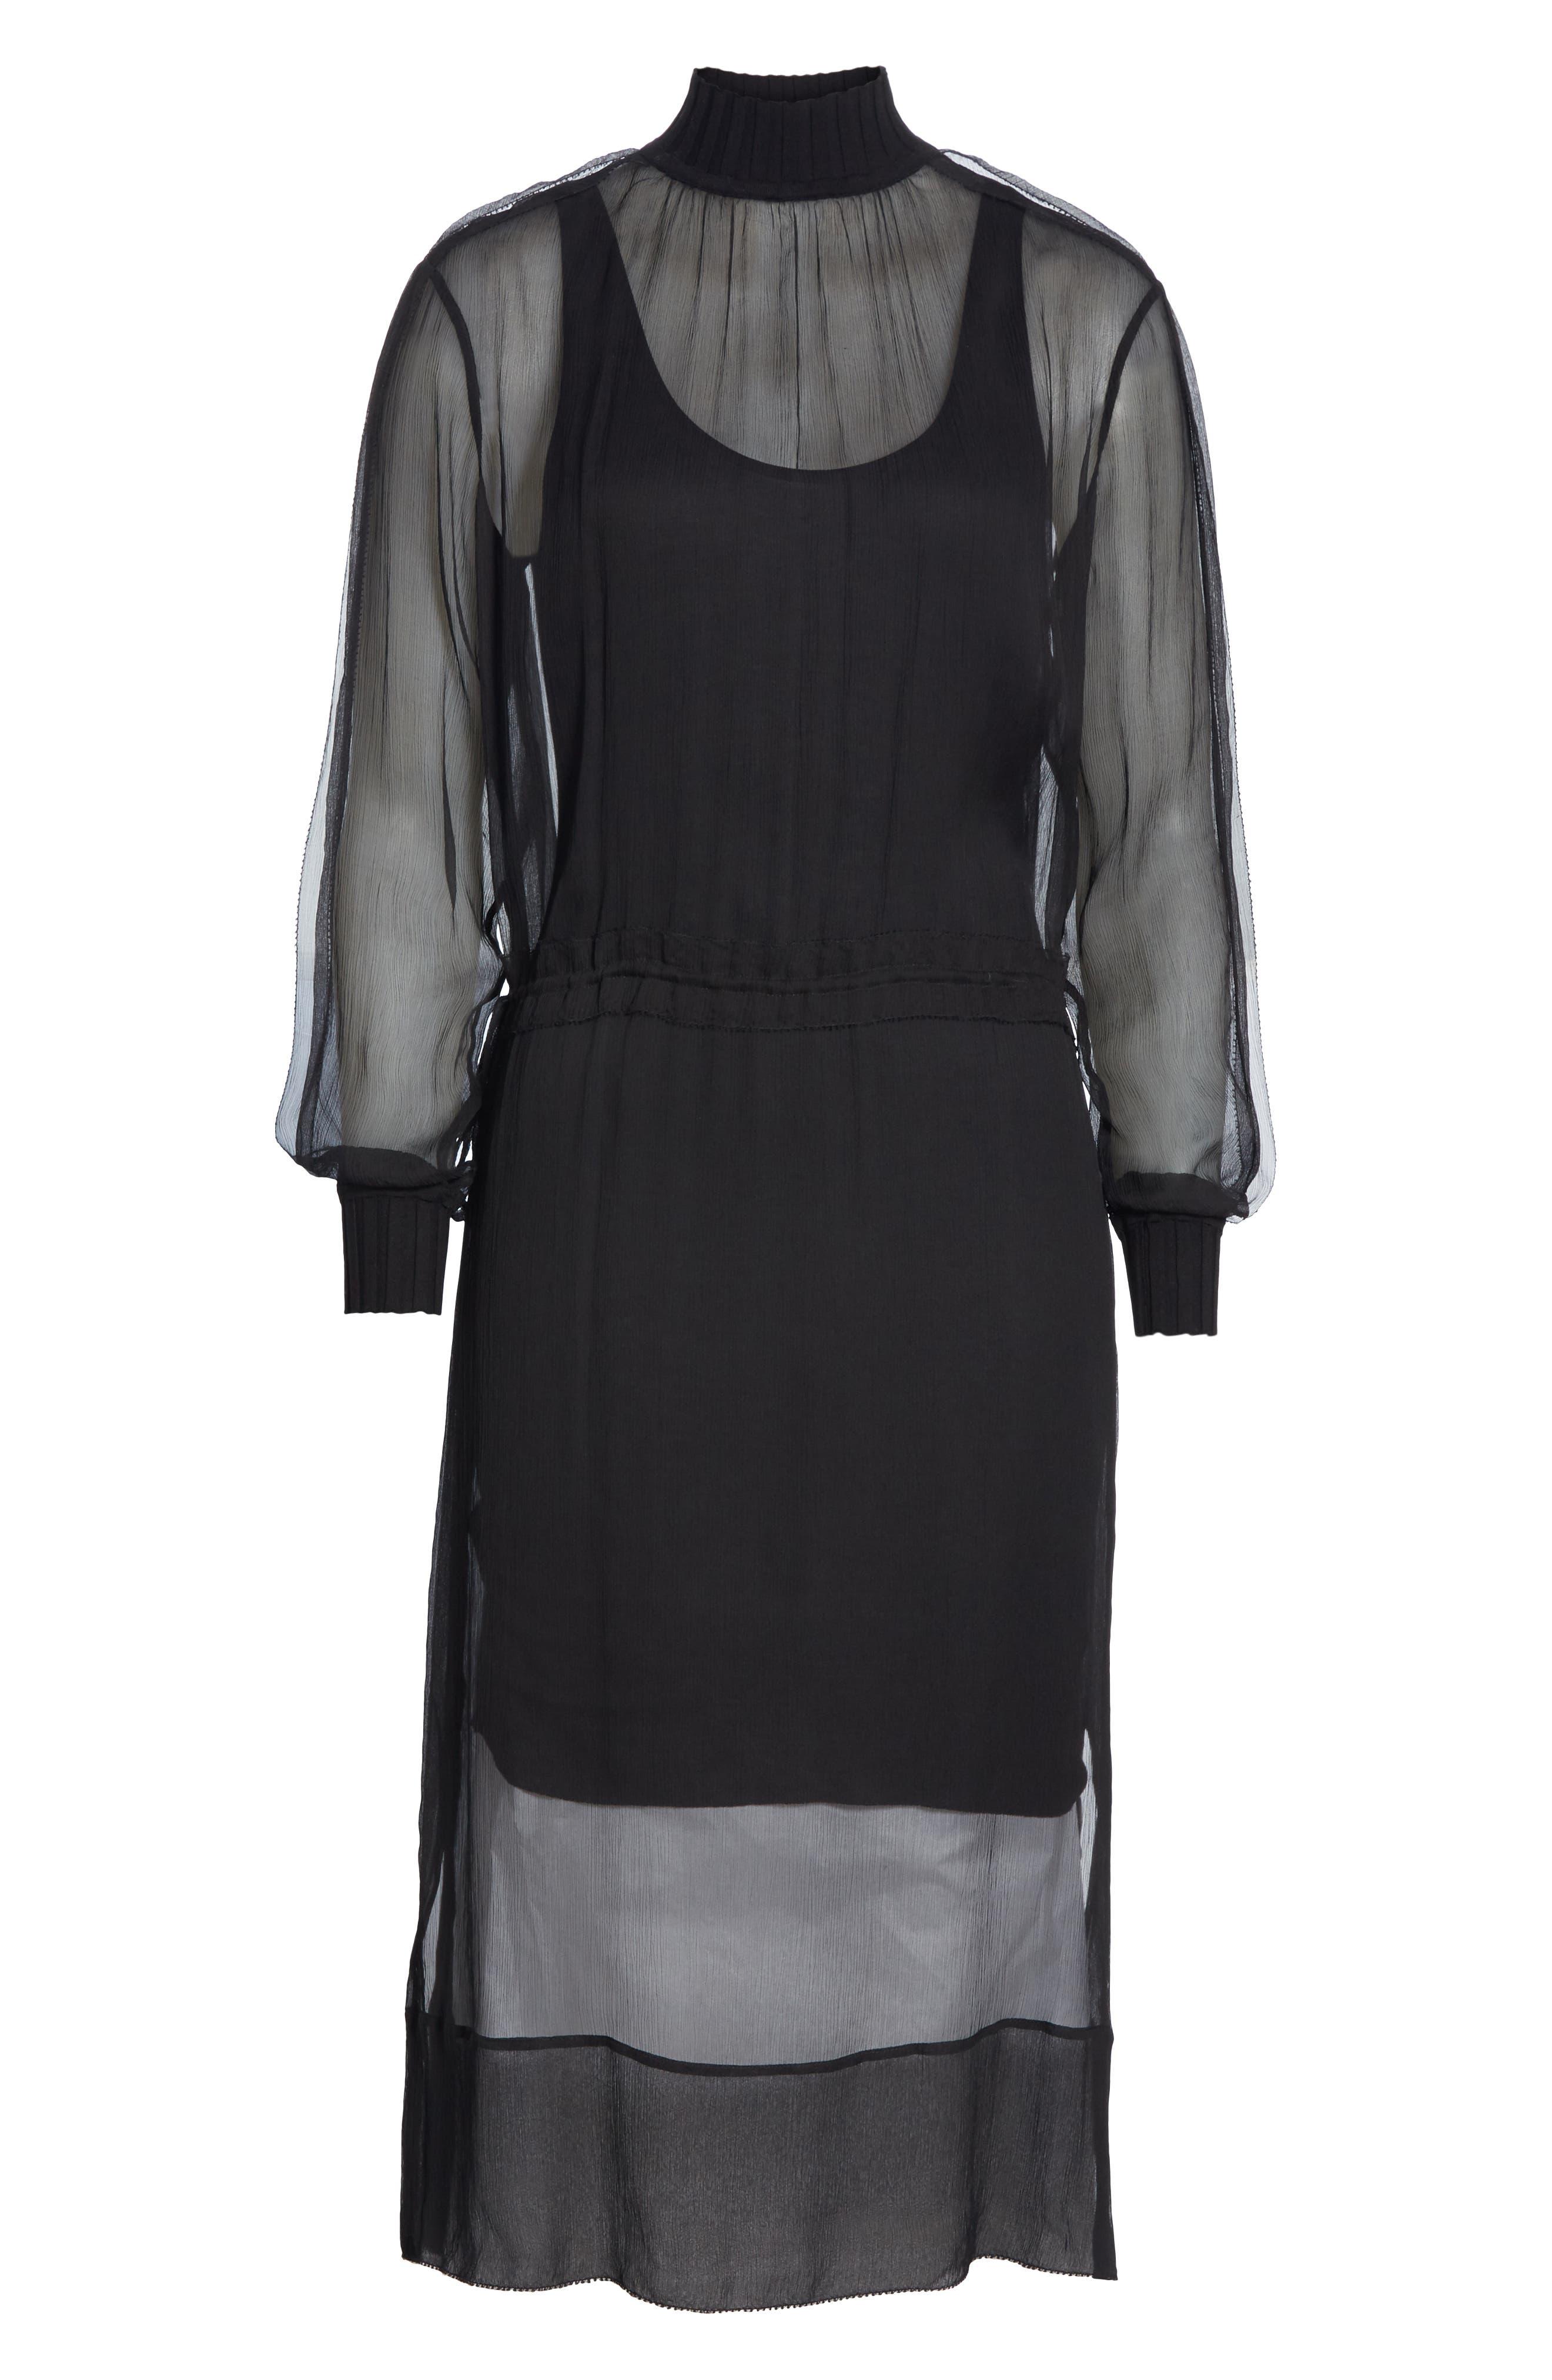 RAG & BONE, Dinah Silk Dress, Alternate thumbnail 7, color, 001